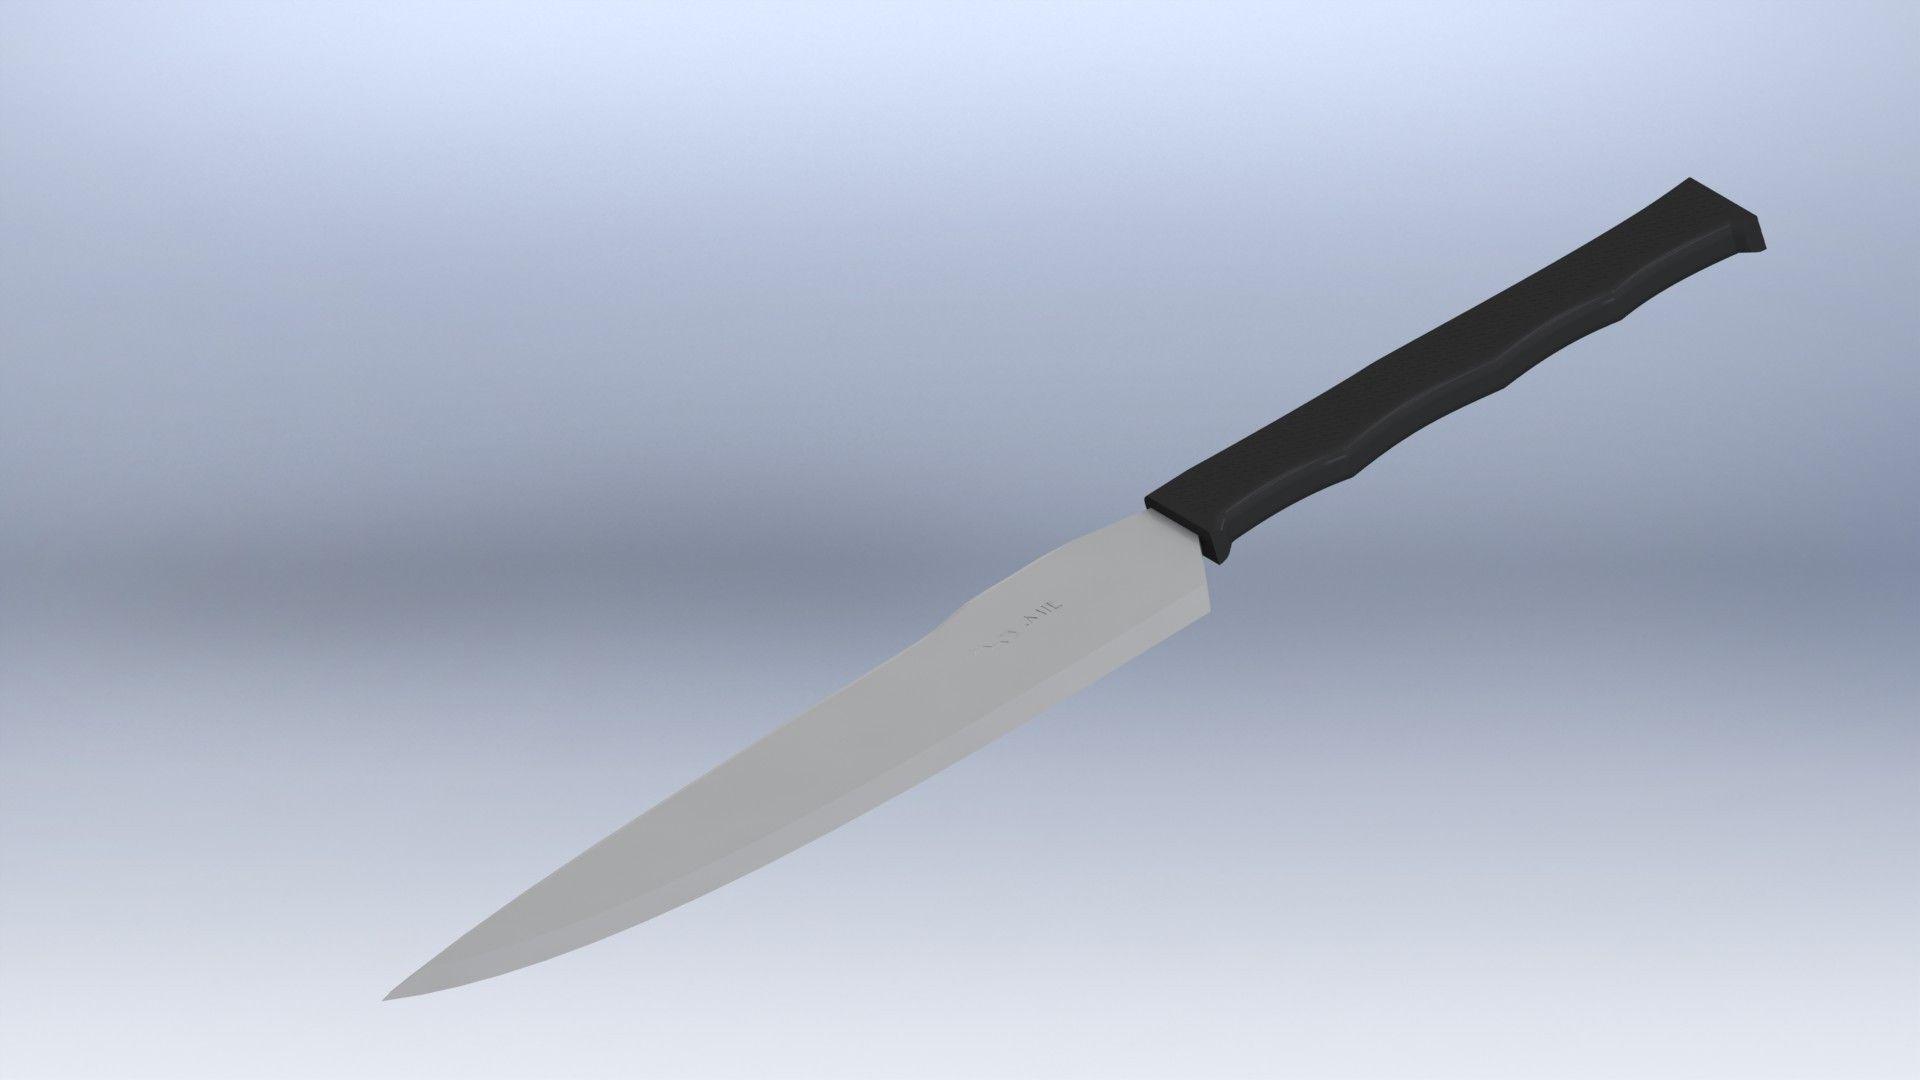 28 tactical kitchen knives tactical kitchen knife xl war s tactical kitchen chefs knife free 3d model stl cgtrader com set tactical kitchen knives 250 00